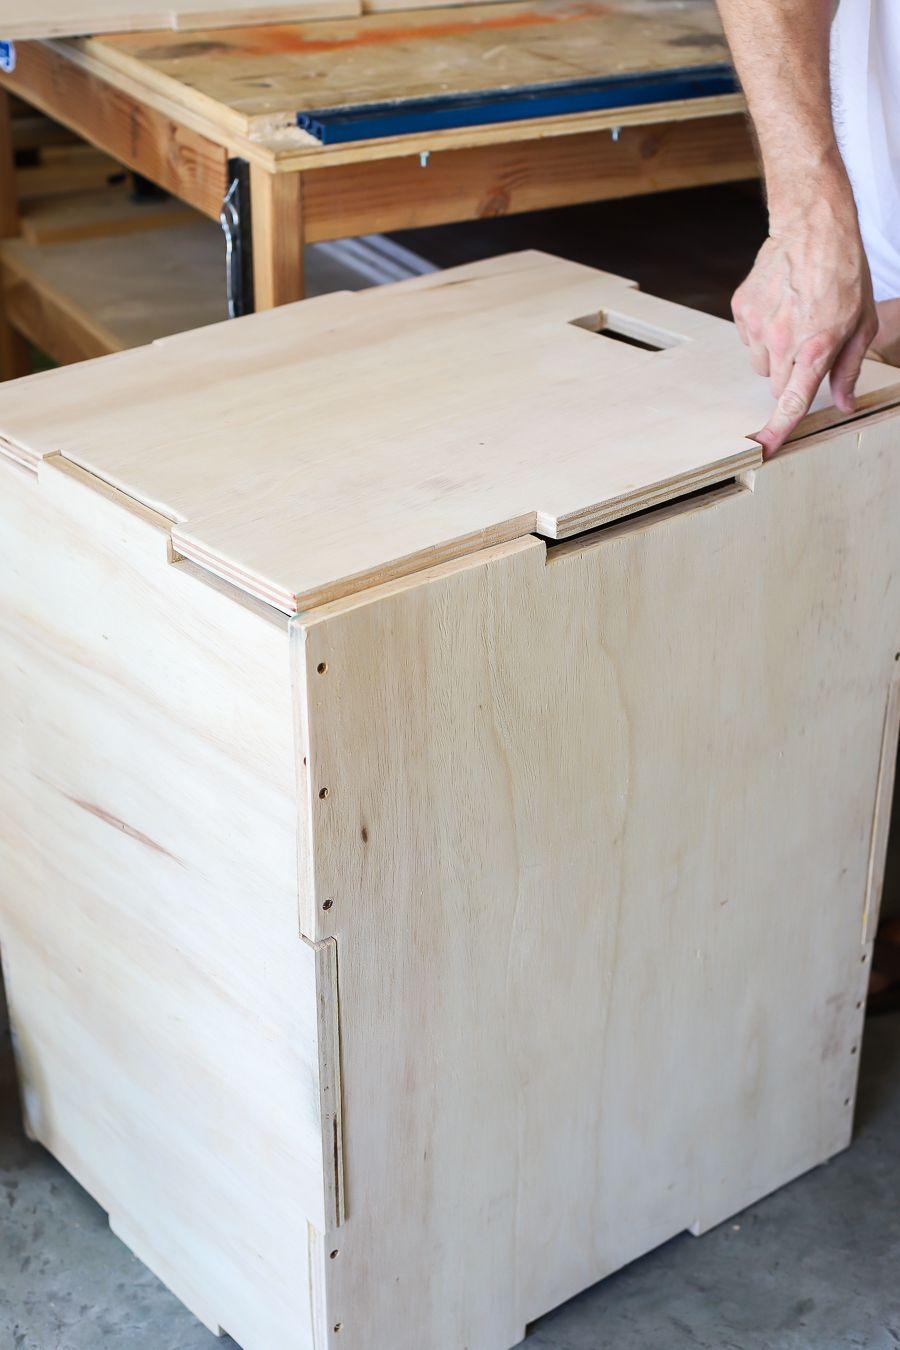 Plyometric Jump Box 3in1 Crossfit Plyo Box Fitness Step Up Dips